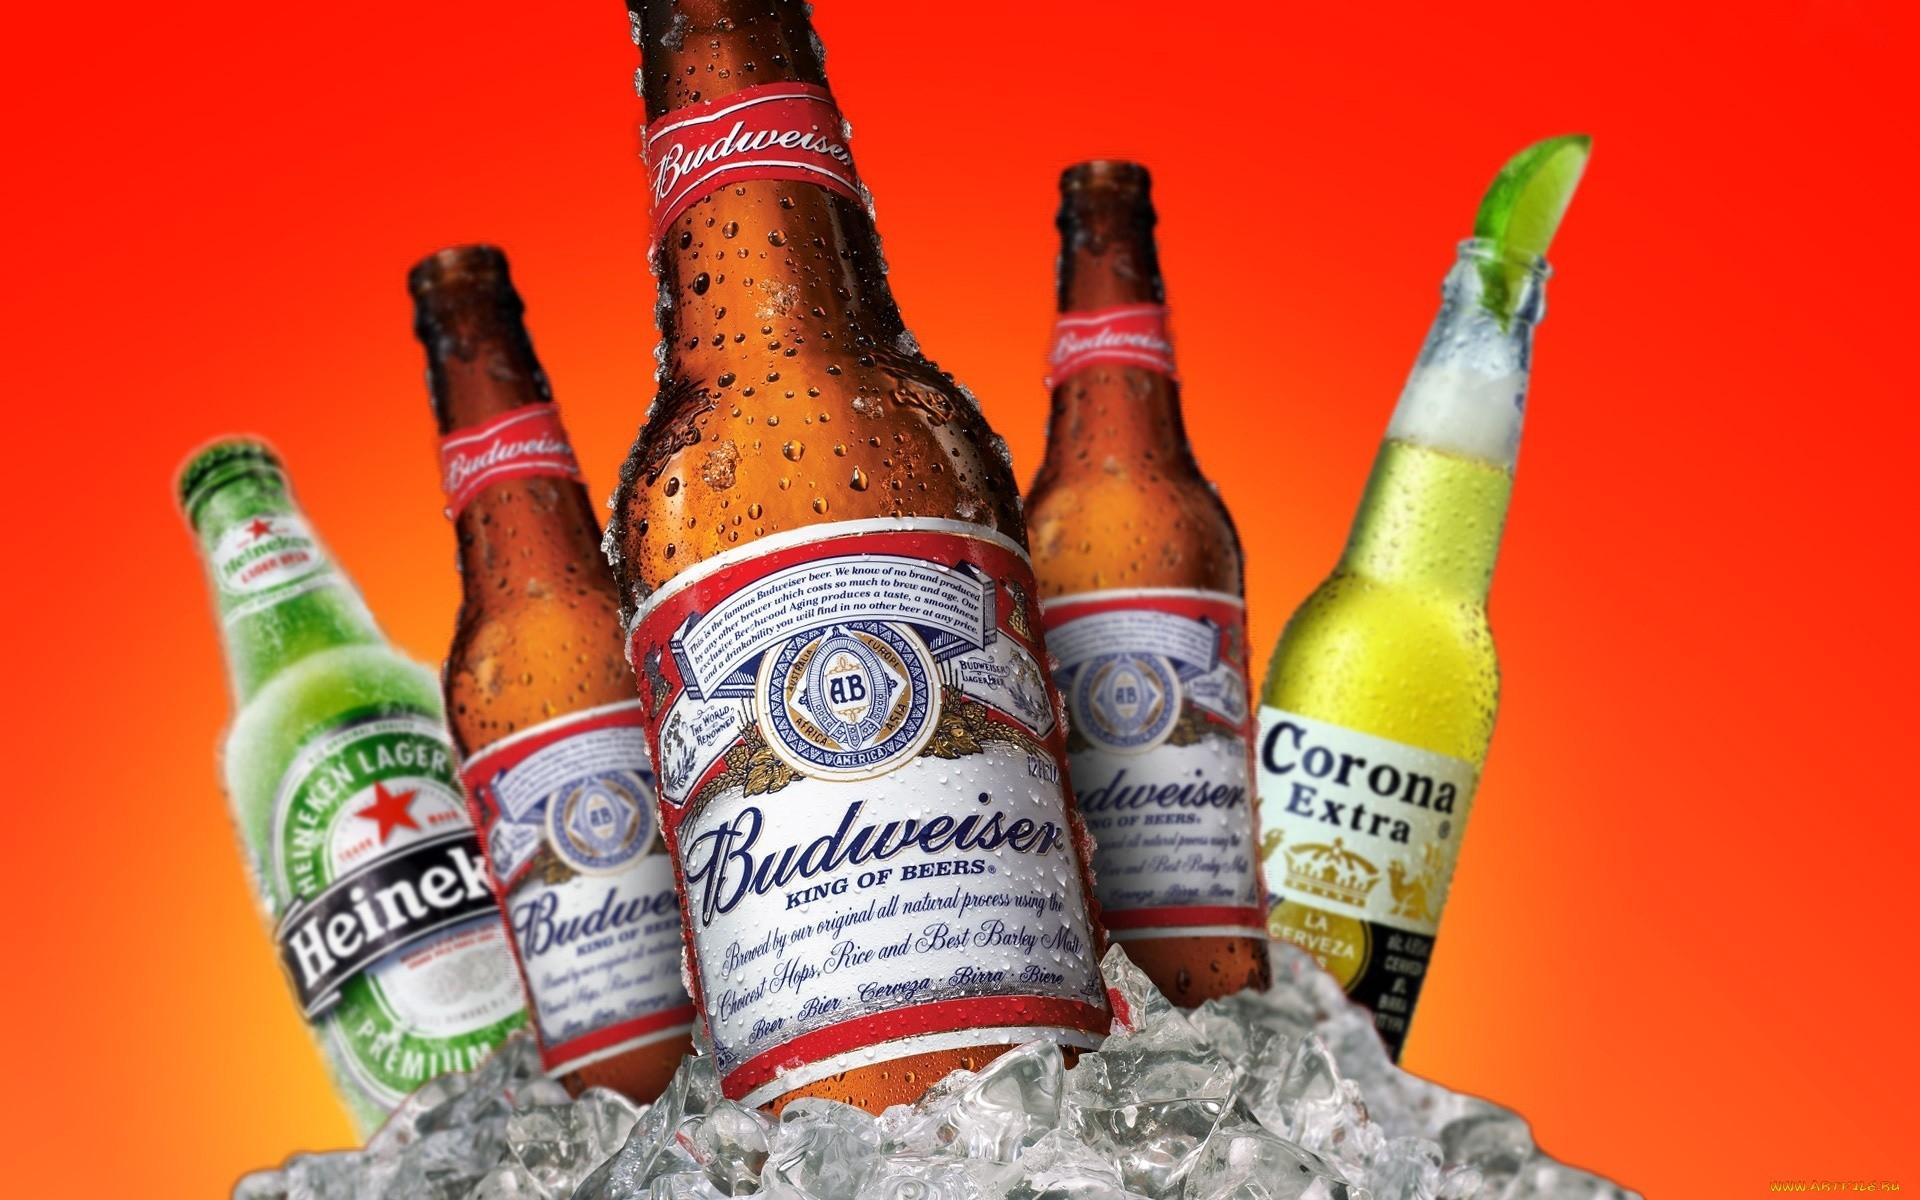 Wallpaper Budweiser Heineken Corona Extra Drops Ice Beer